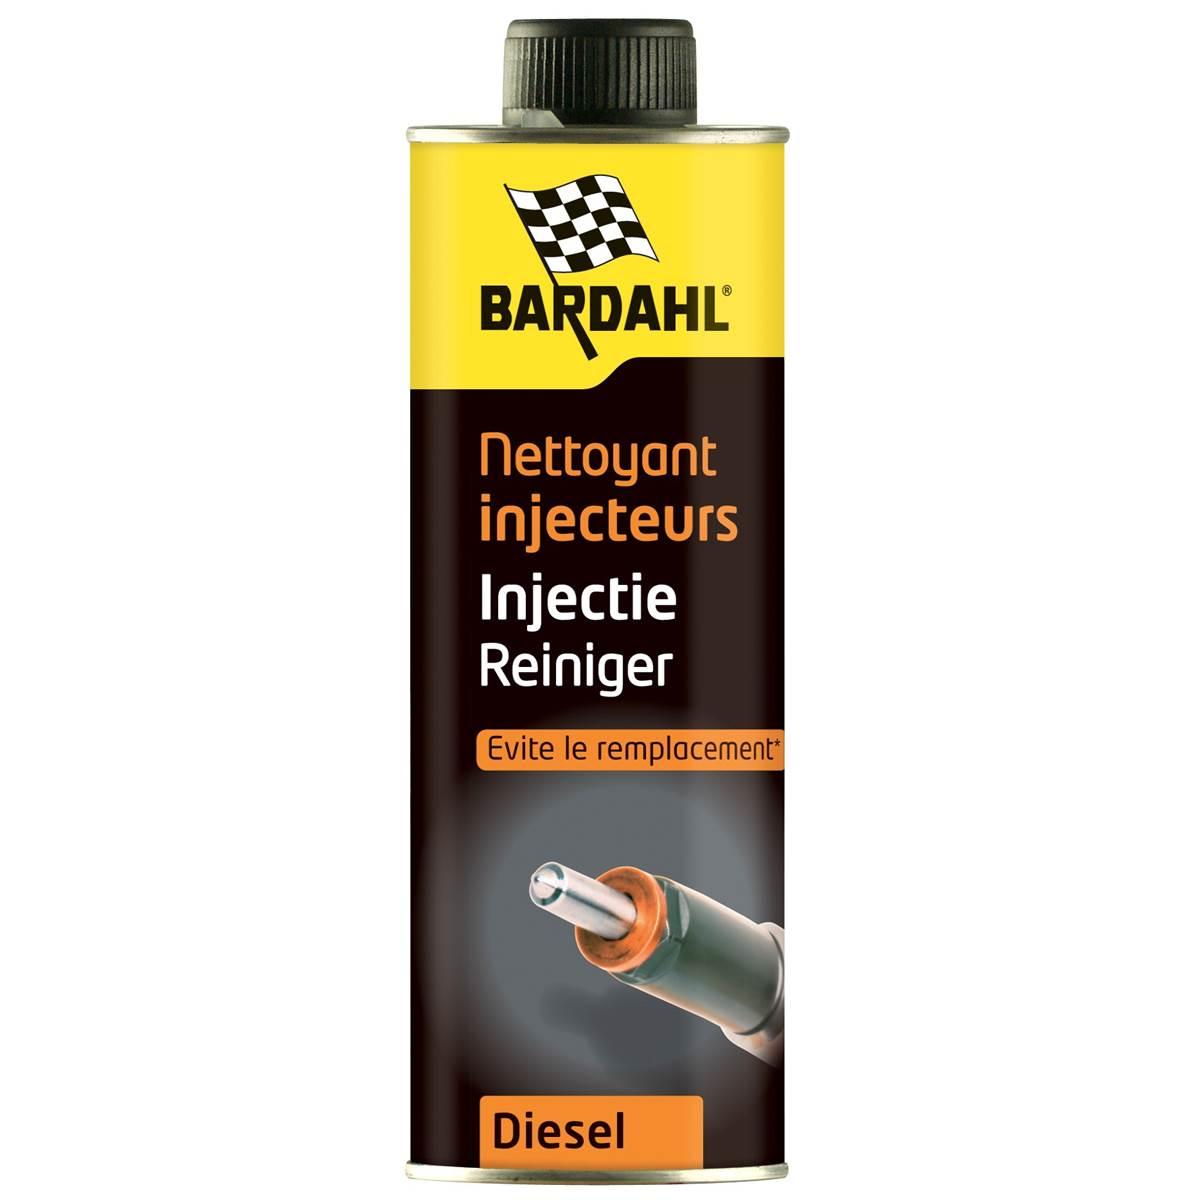 Nettoyant injecteurs Diesel Bardahl 500 ml